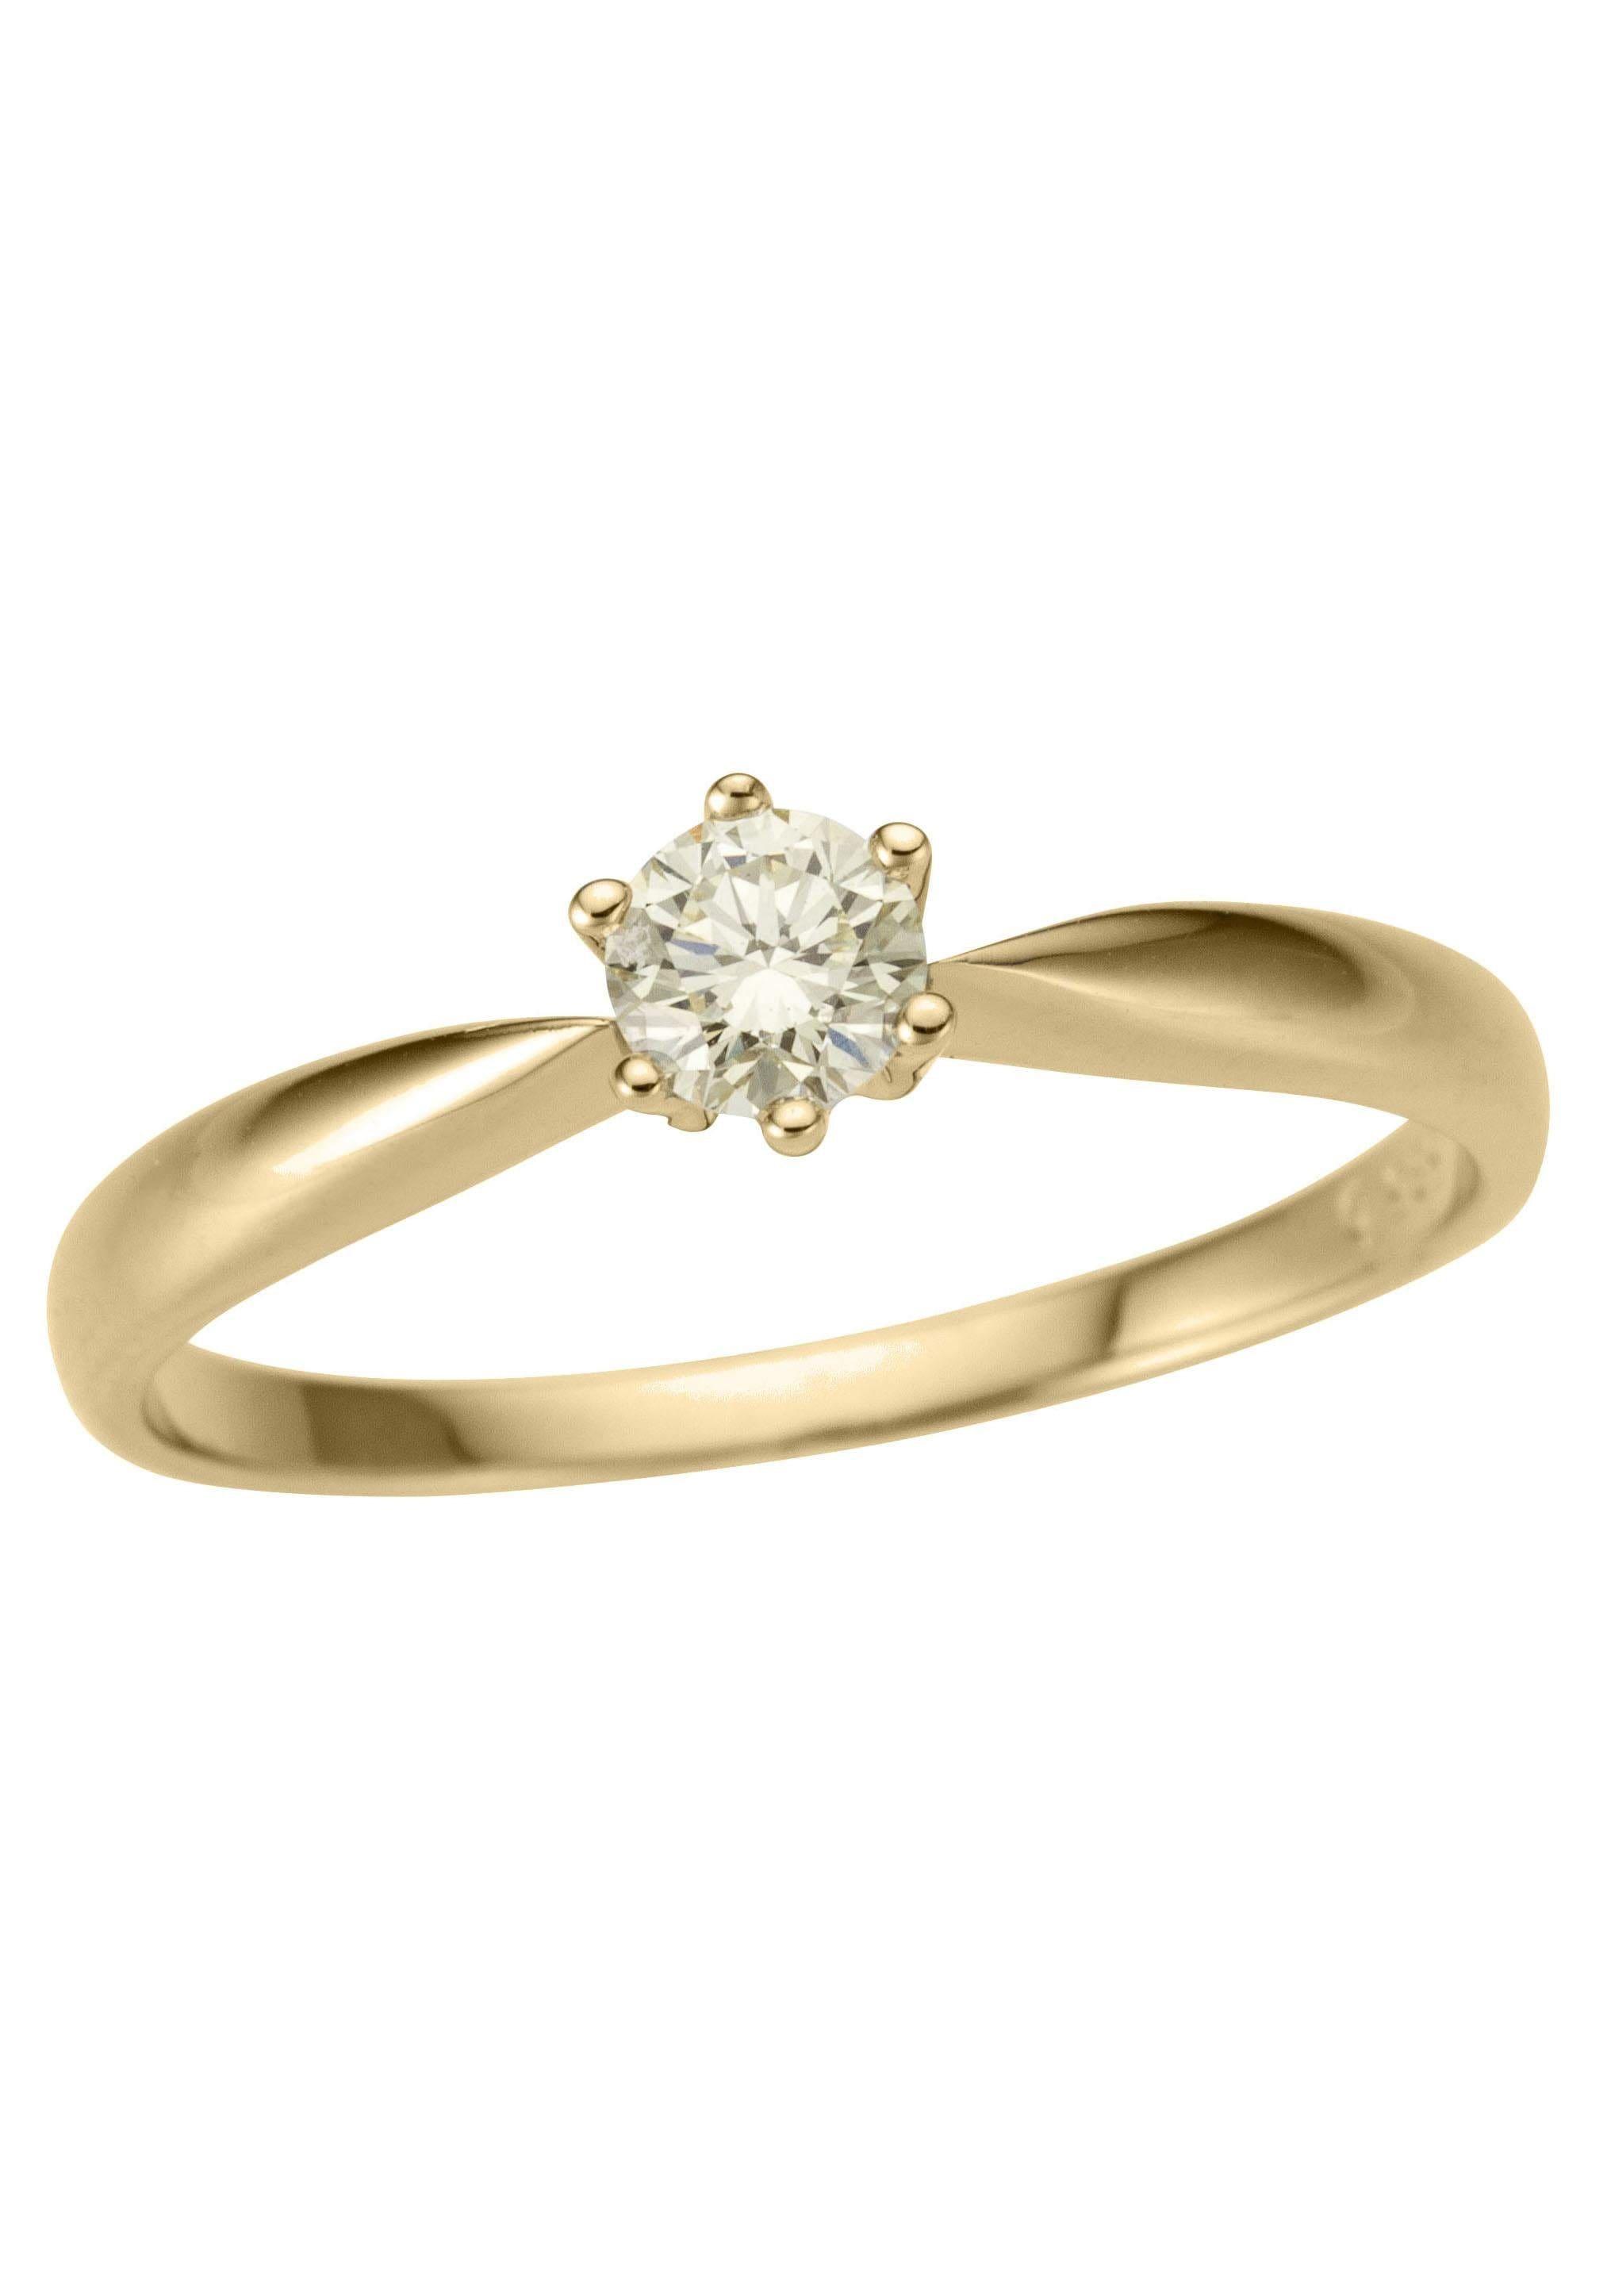 Firetti Fingerring Verlobungsring Vorsteckring Solitär Gelbgold | Schmuck > Ringe > Fingerringe | Firetti